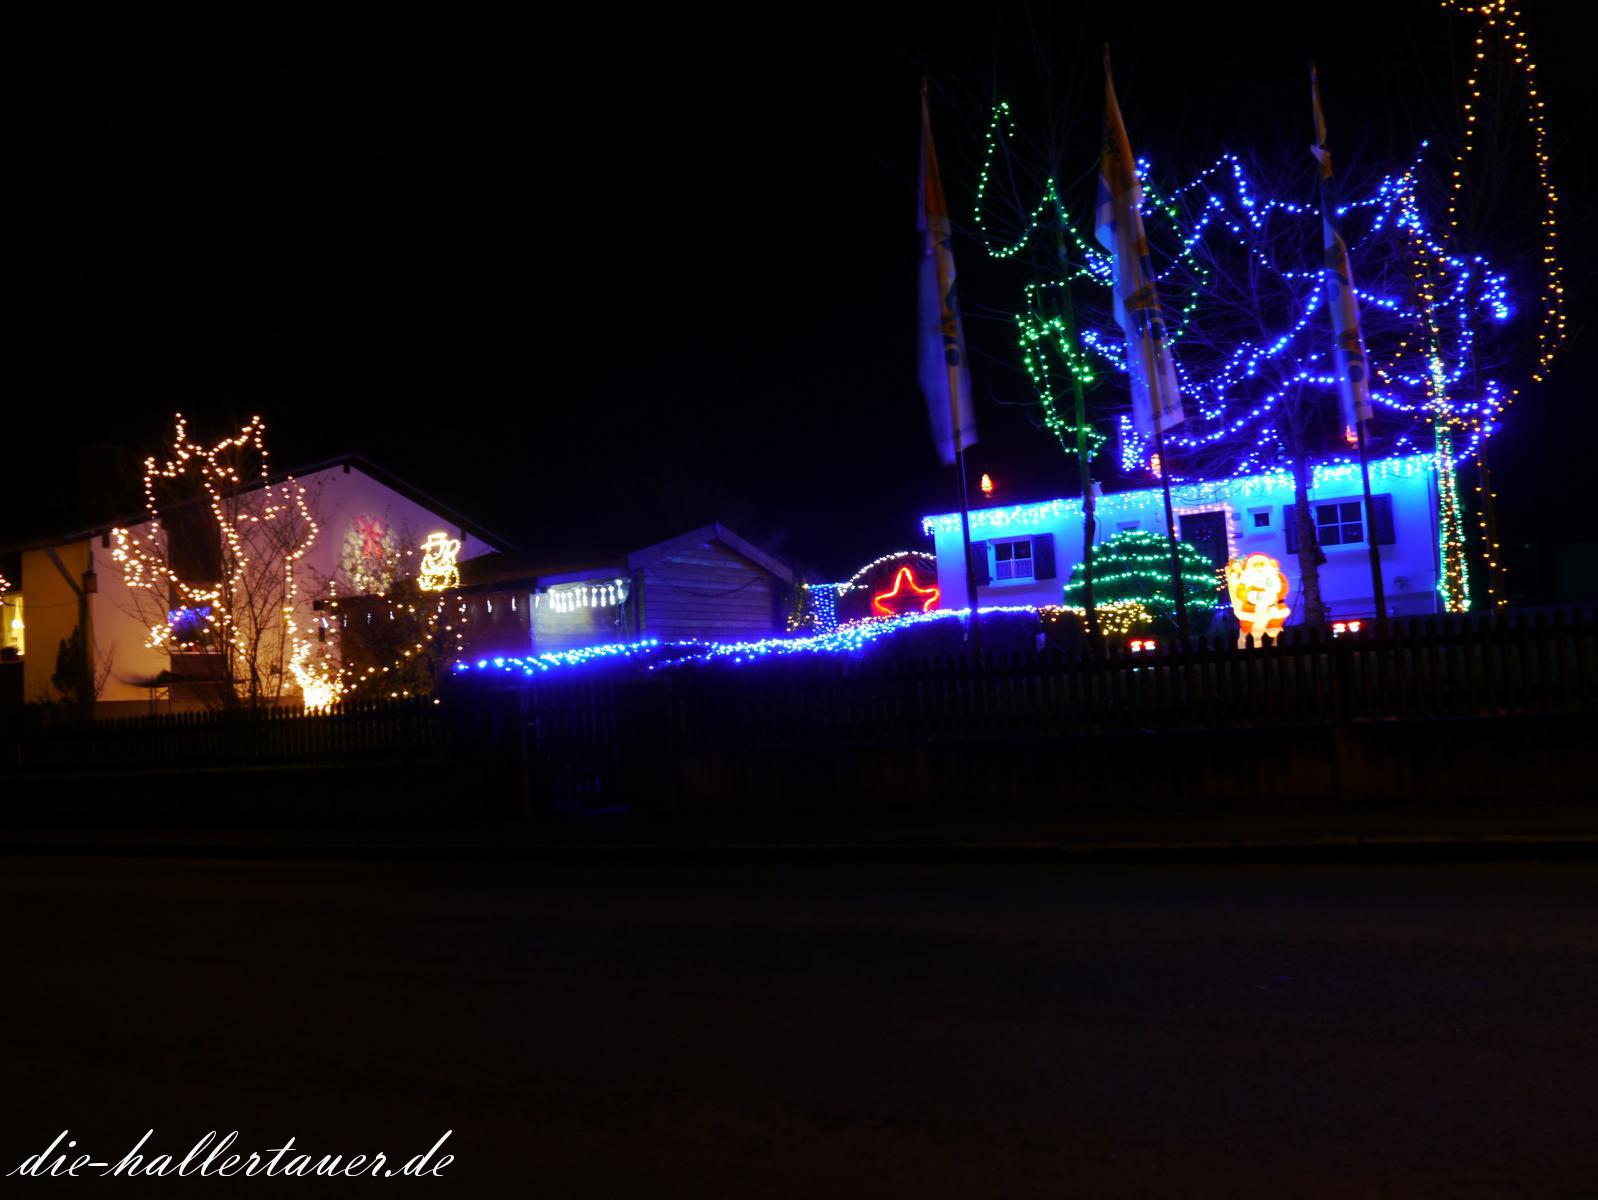 Autohaus Weihnachtsbeleuchtung